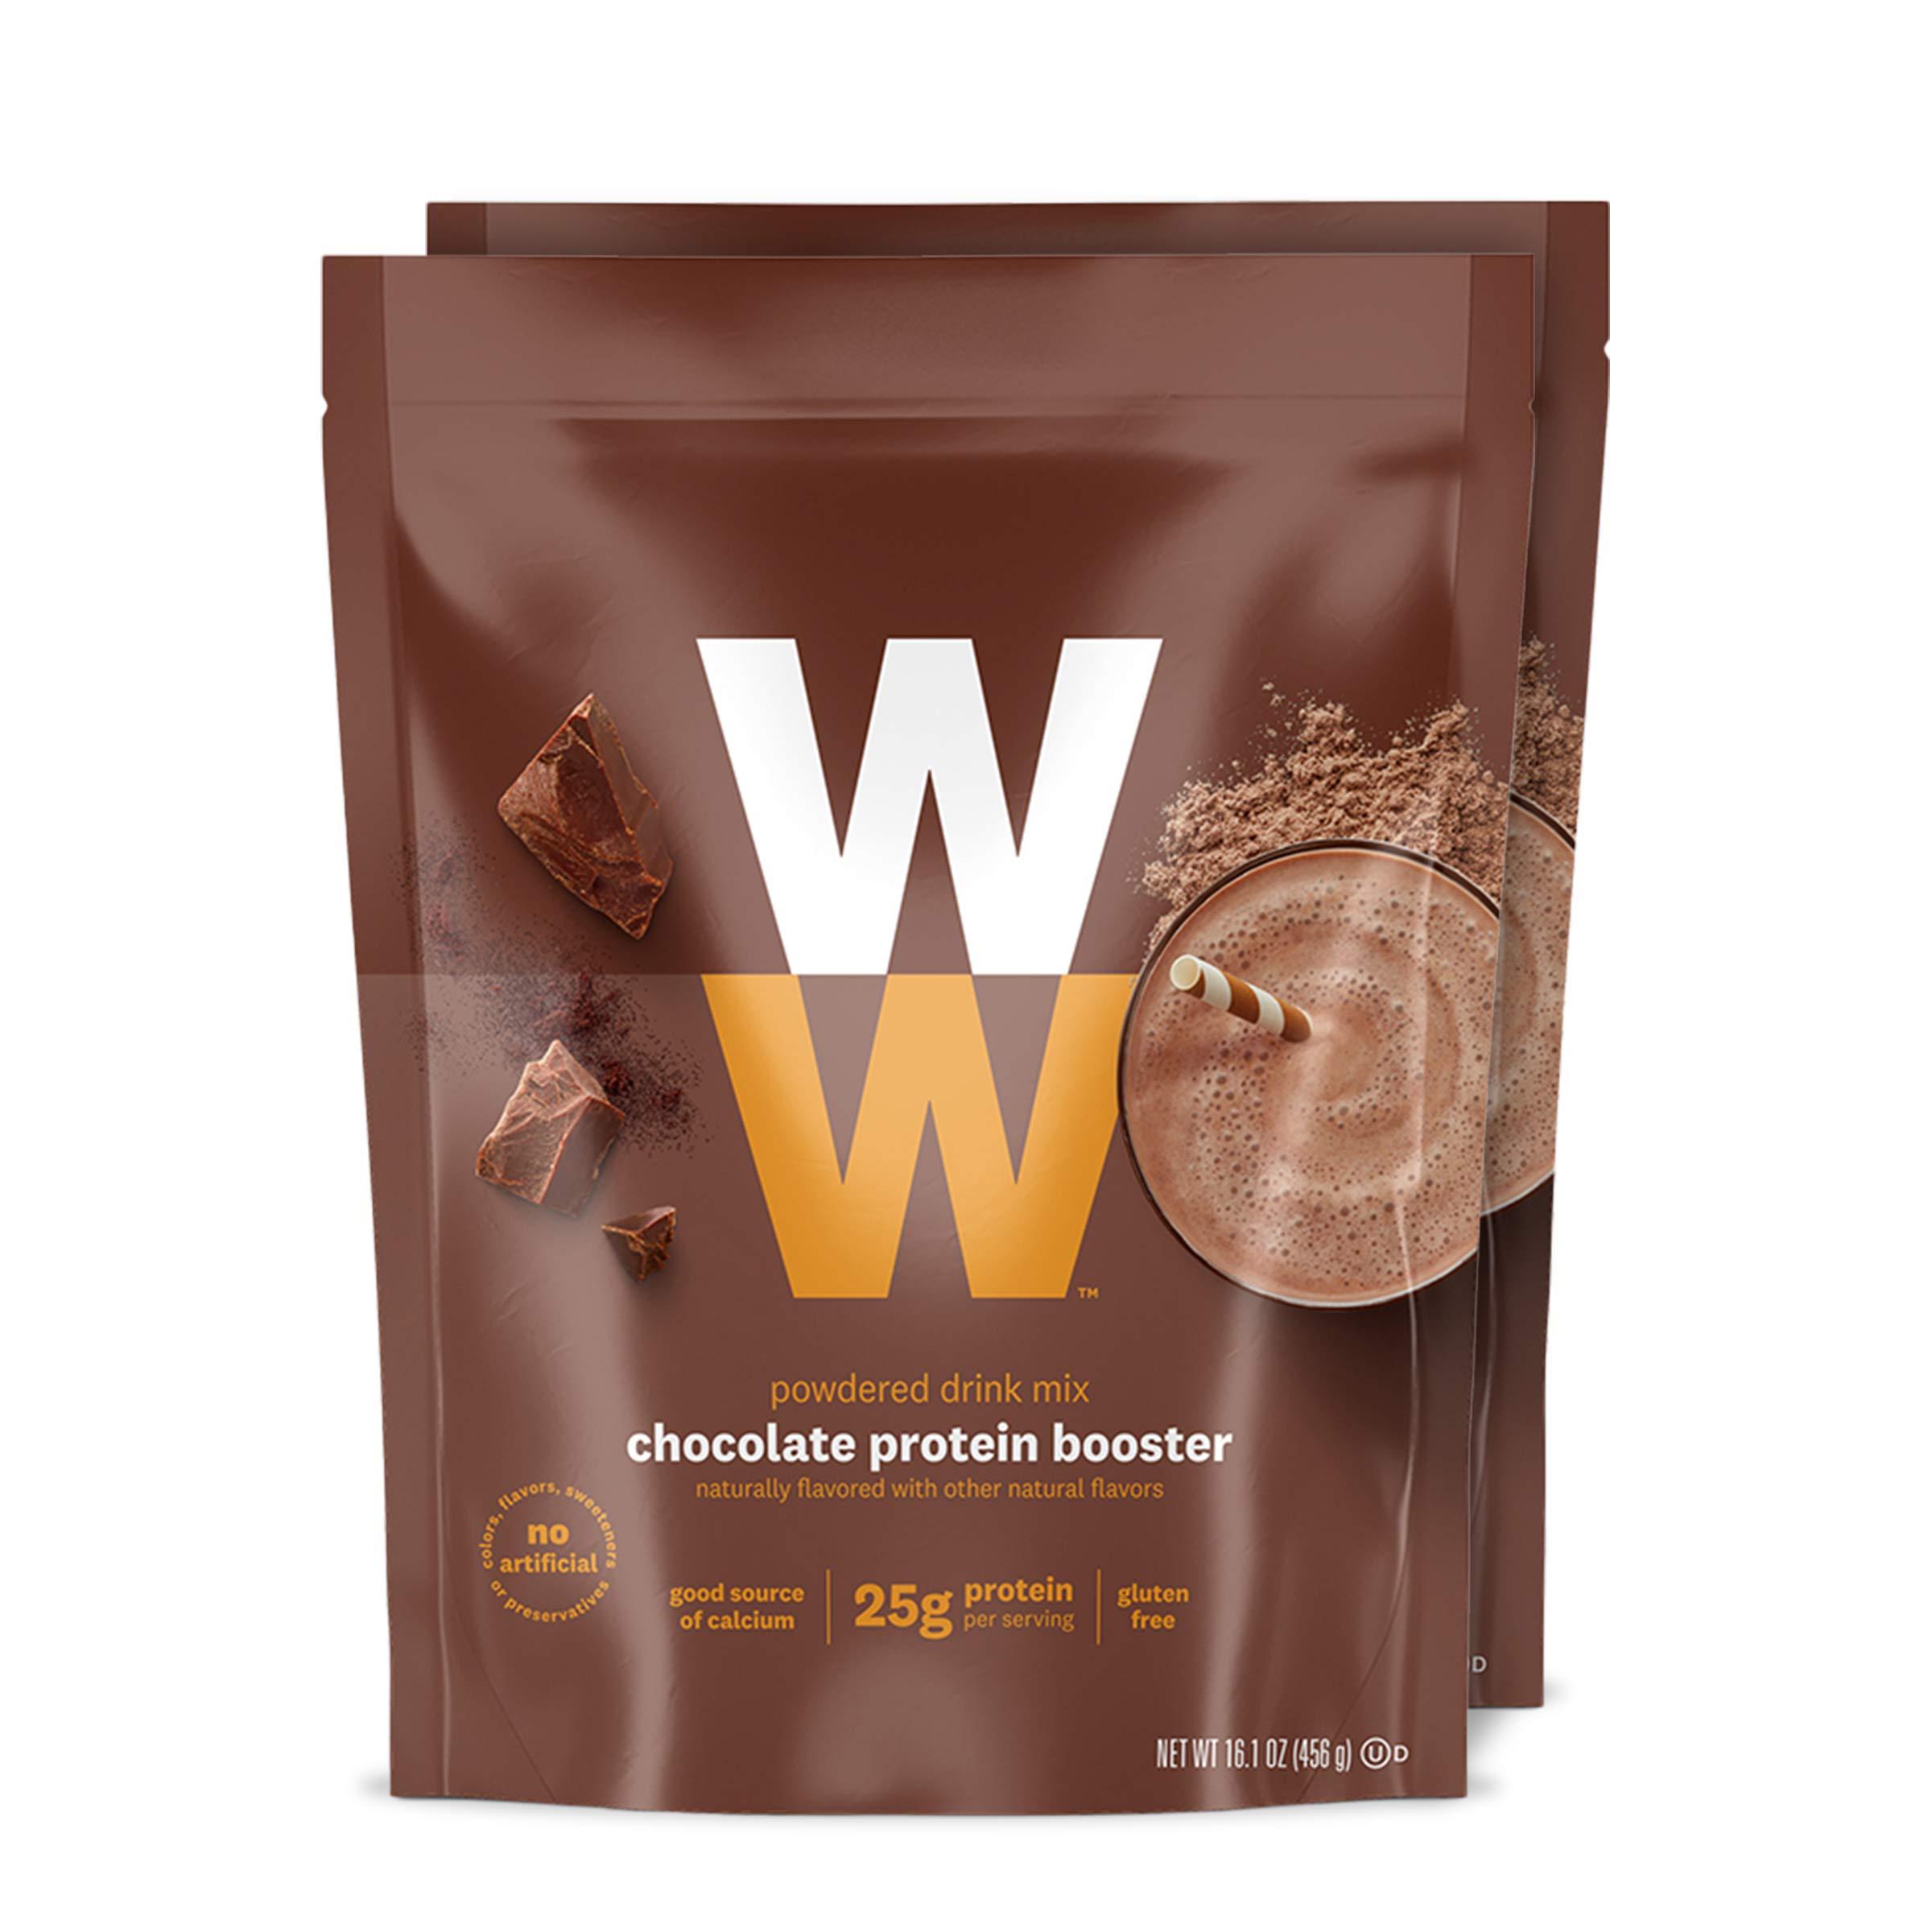 WW Chocolate Protein Booster - Whey Protein Powder, 2 SmartPoints - 2 Pouches - Weight Watchers Reimagined